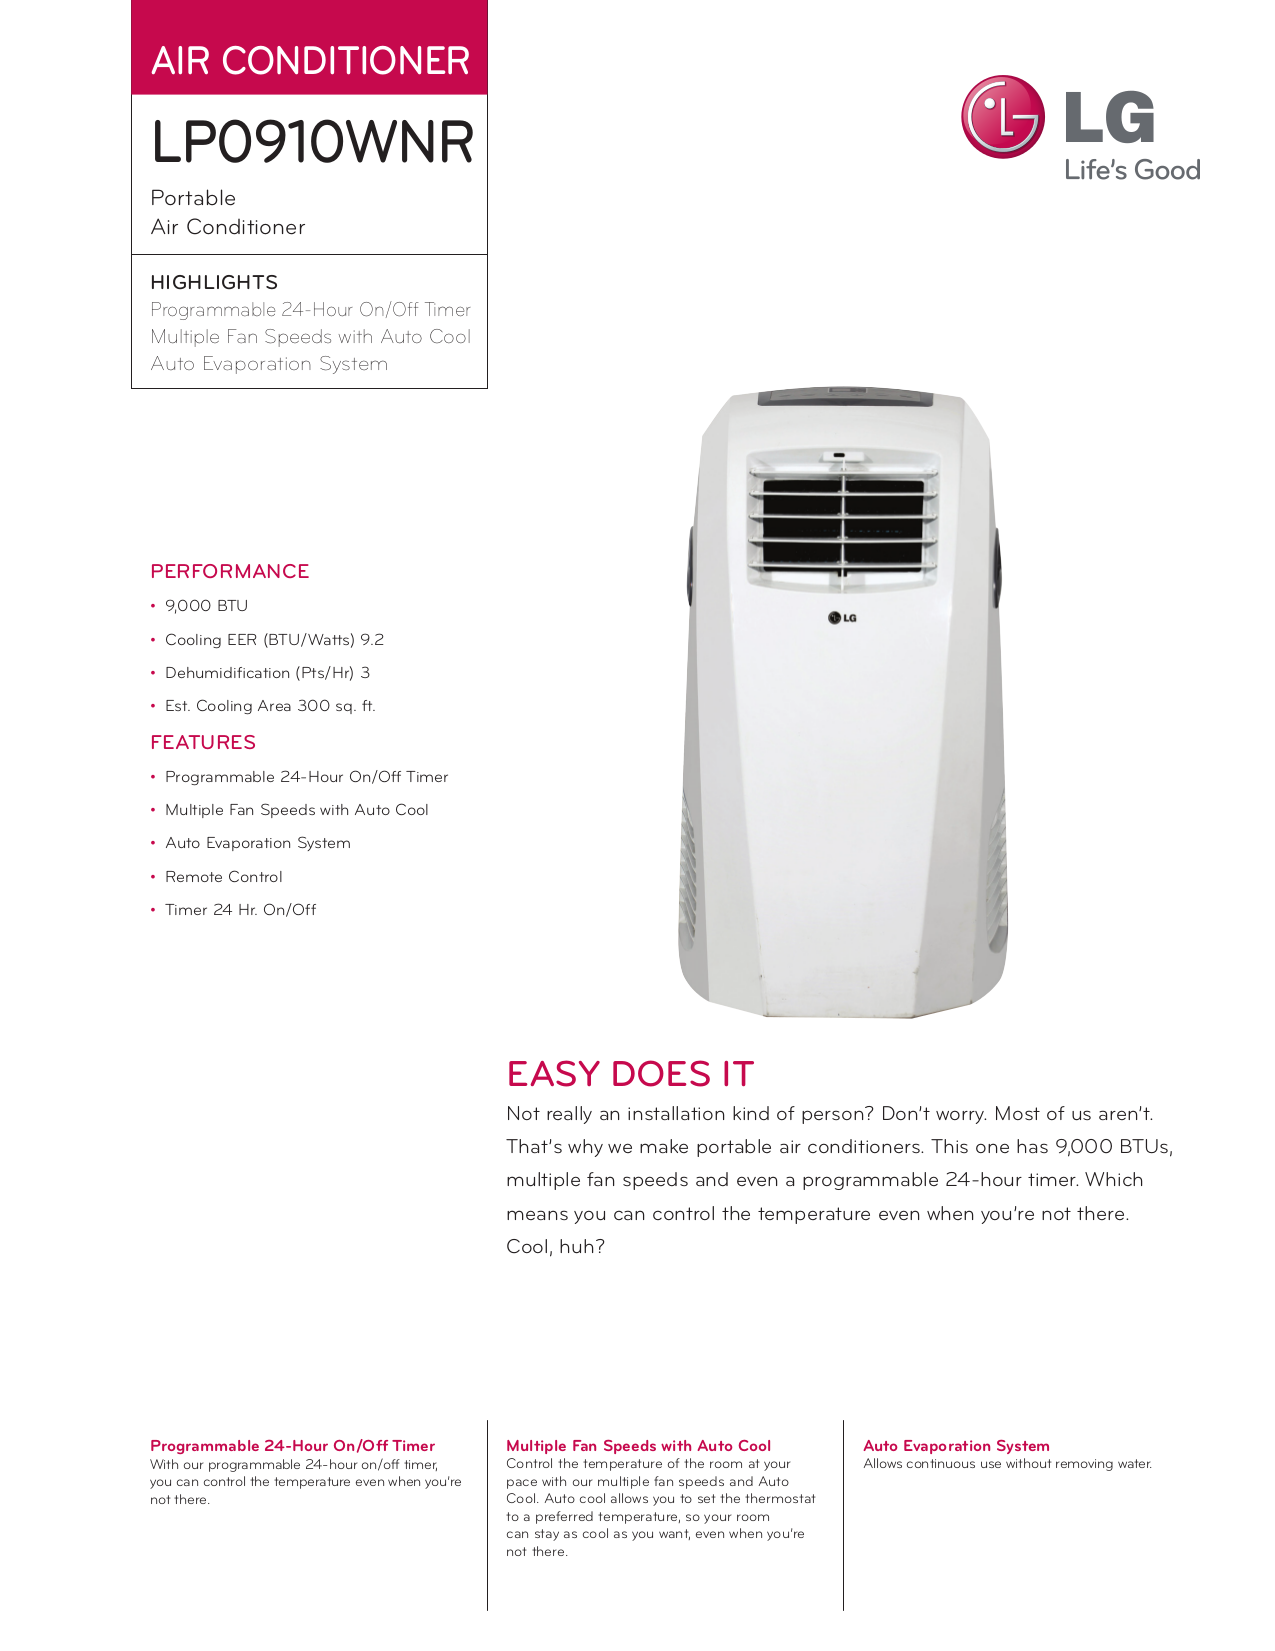 pdf for LG Air Conditioner LP0910WNR manual